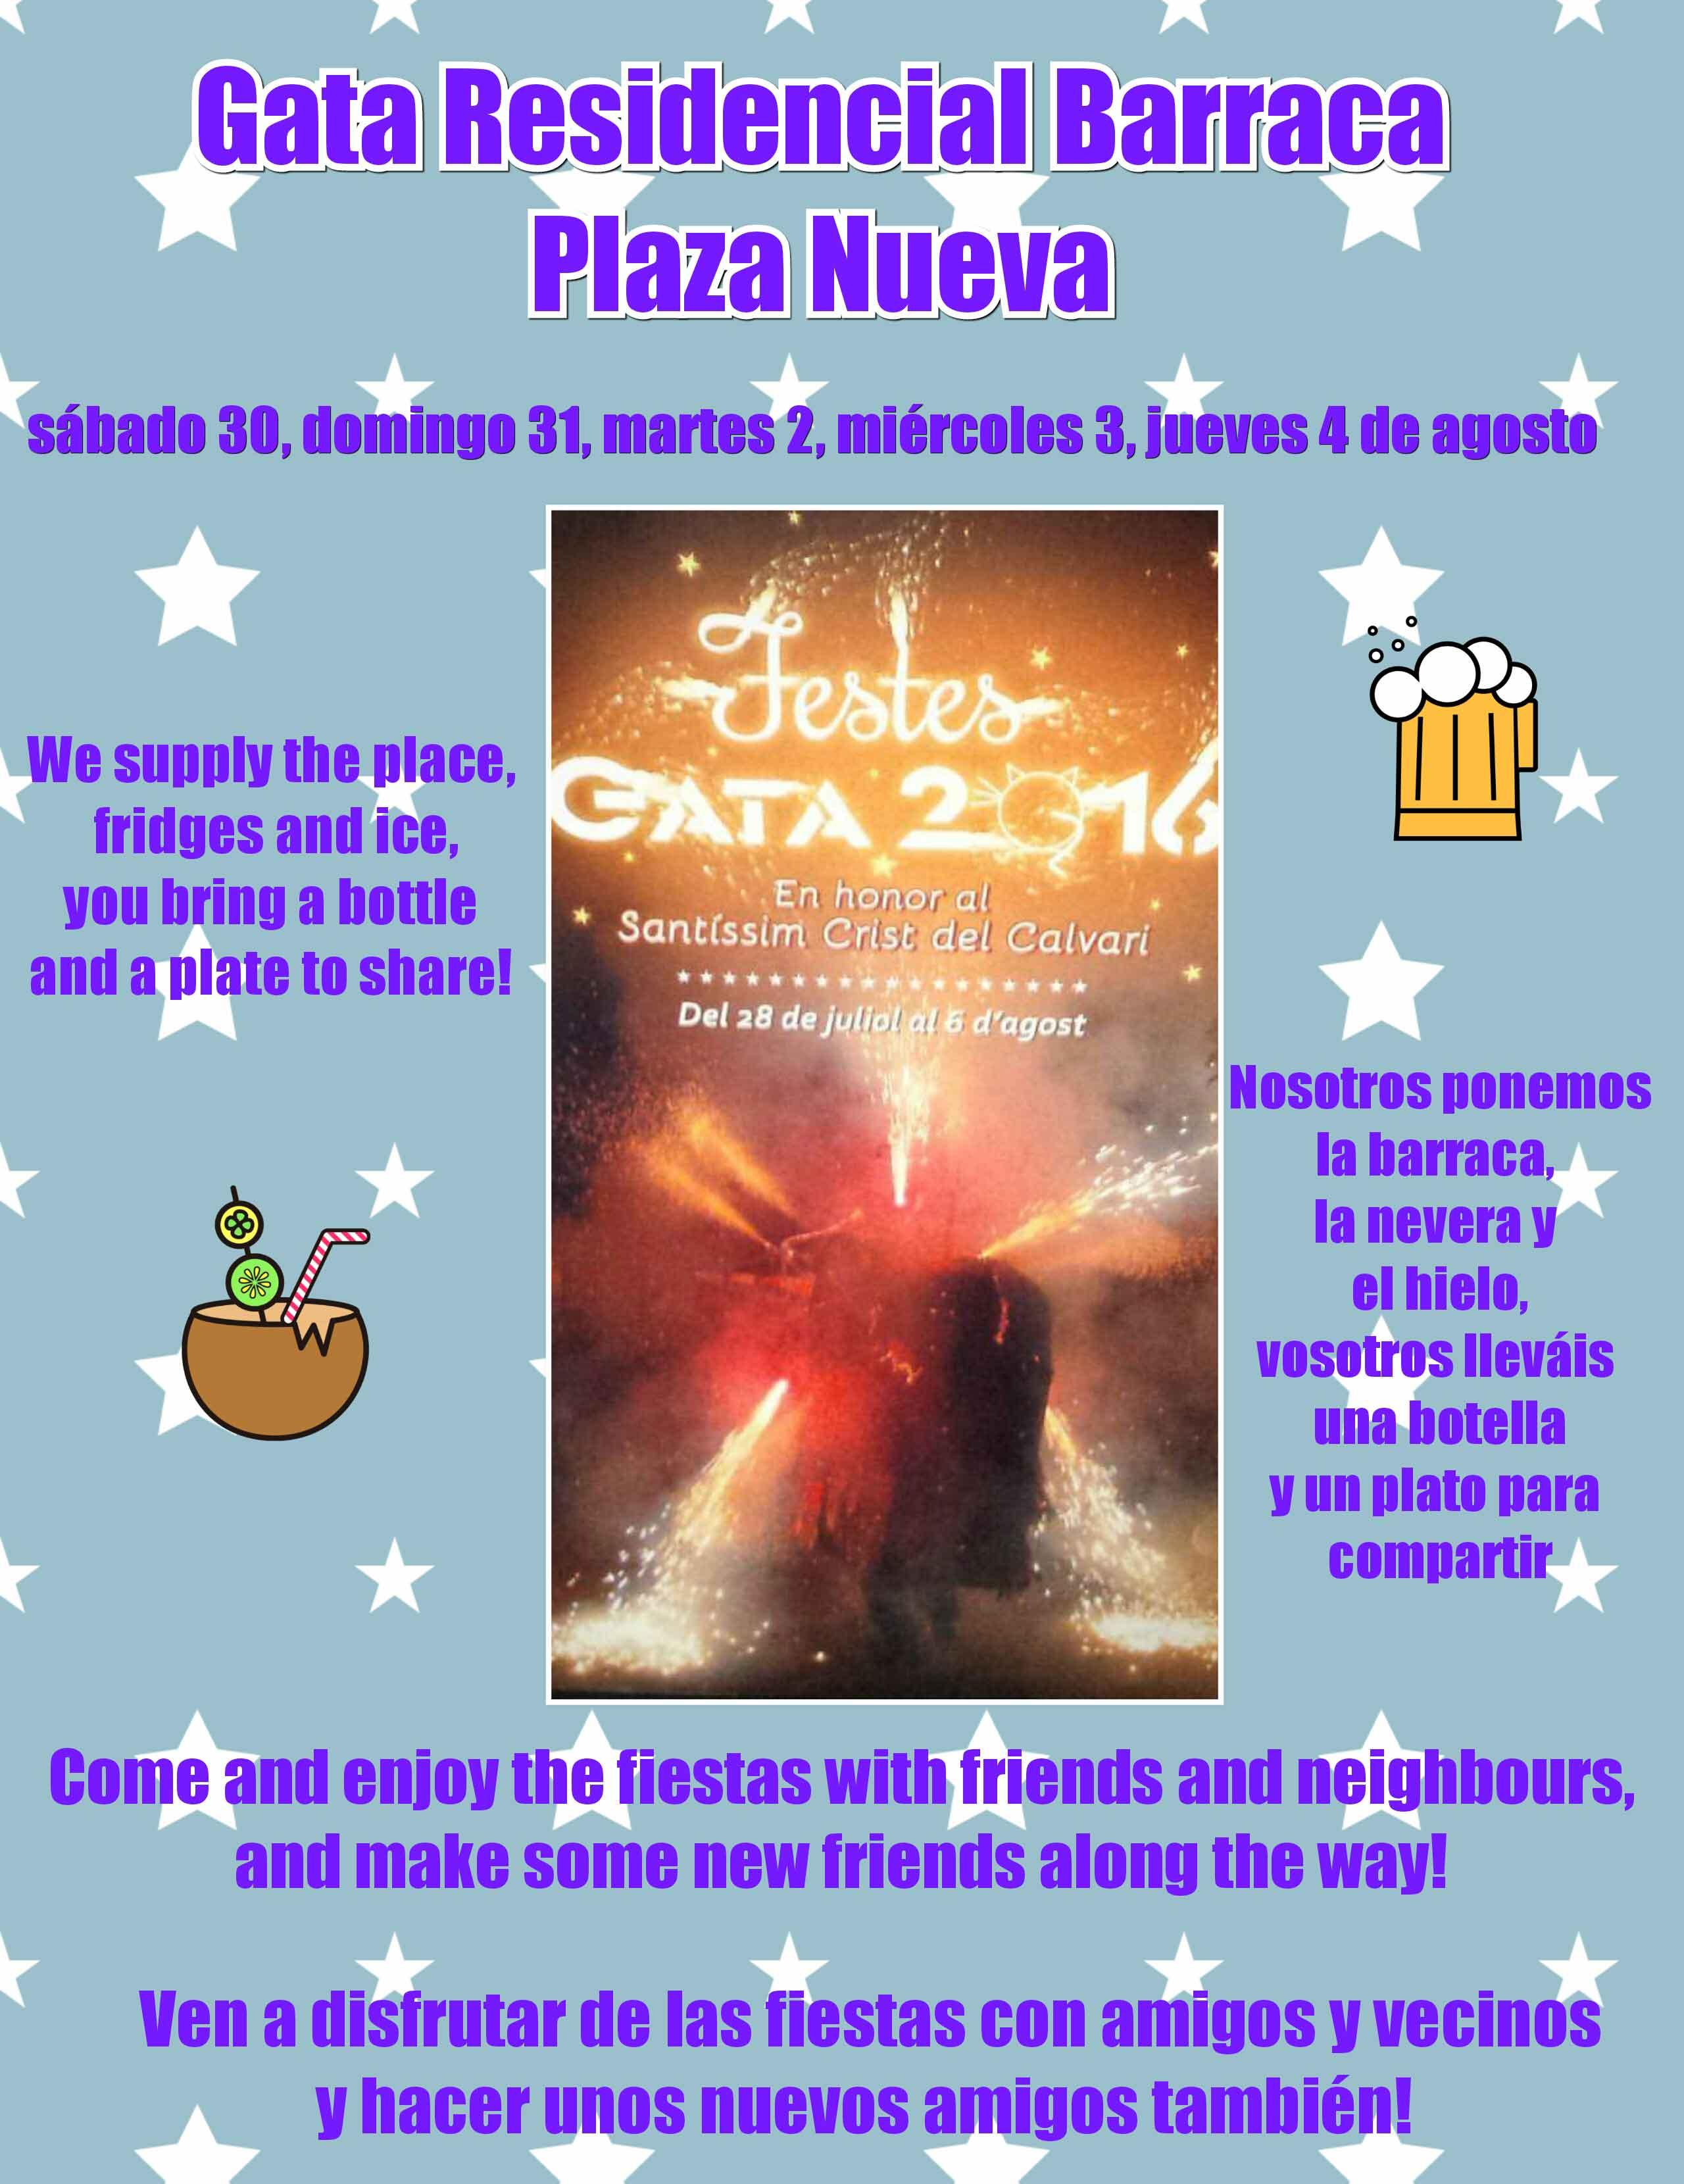 Gatafiesta2016.jpg